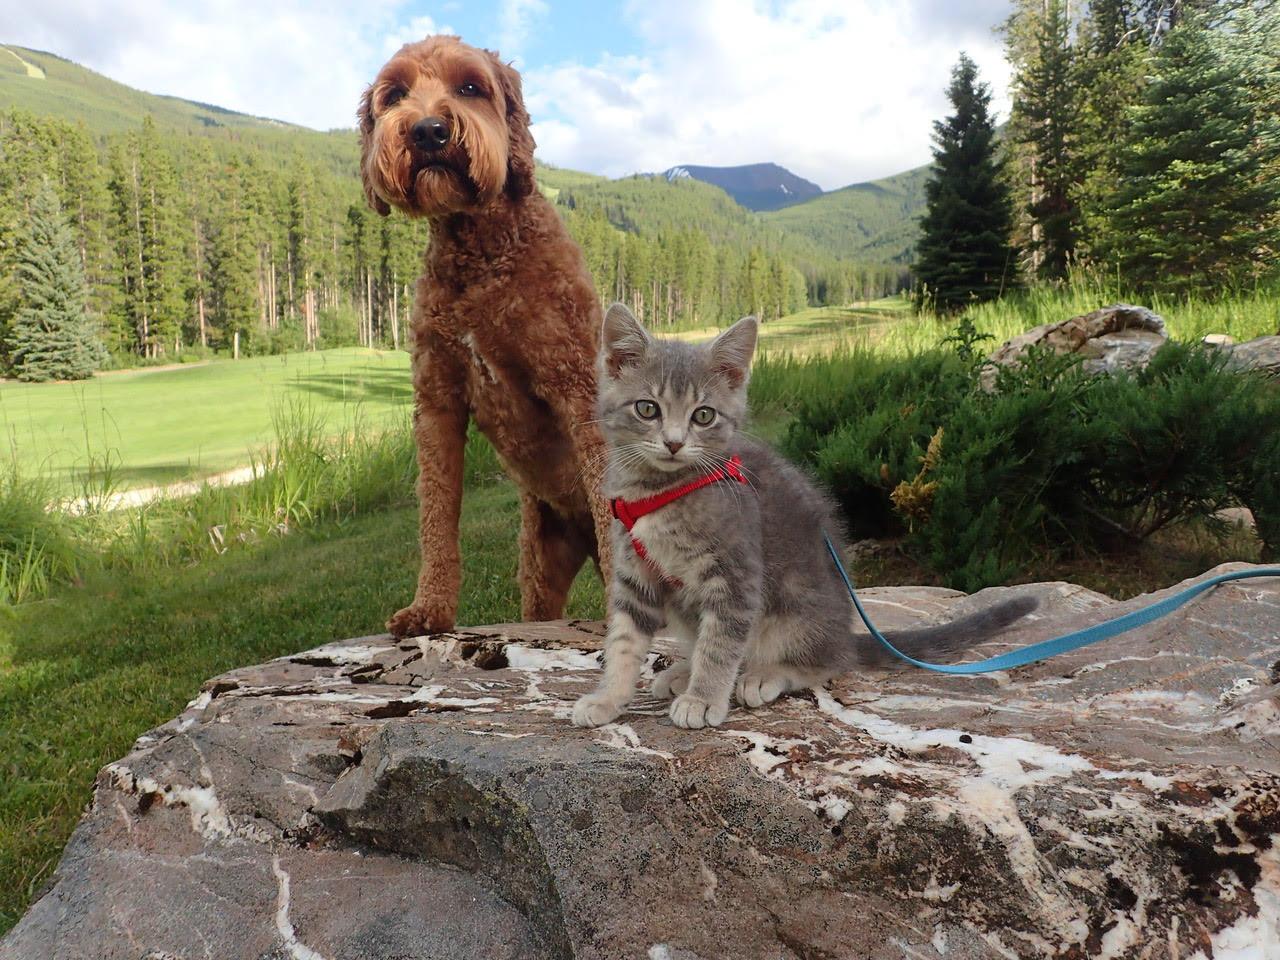 Jessie and Koda adventuring together